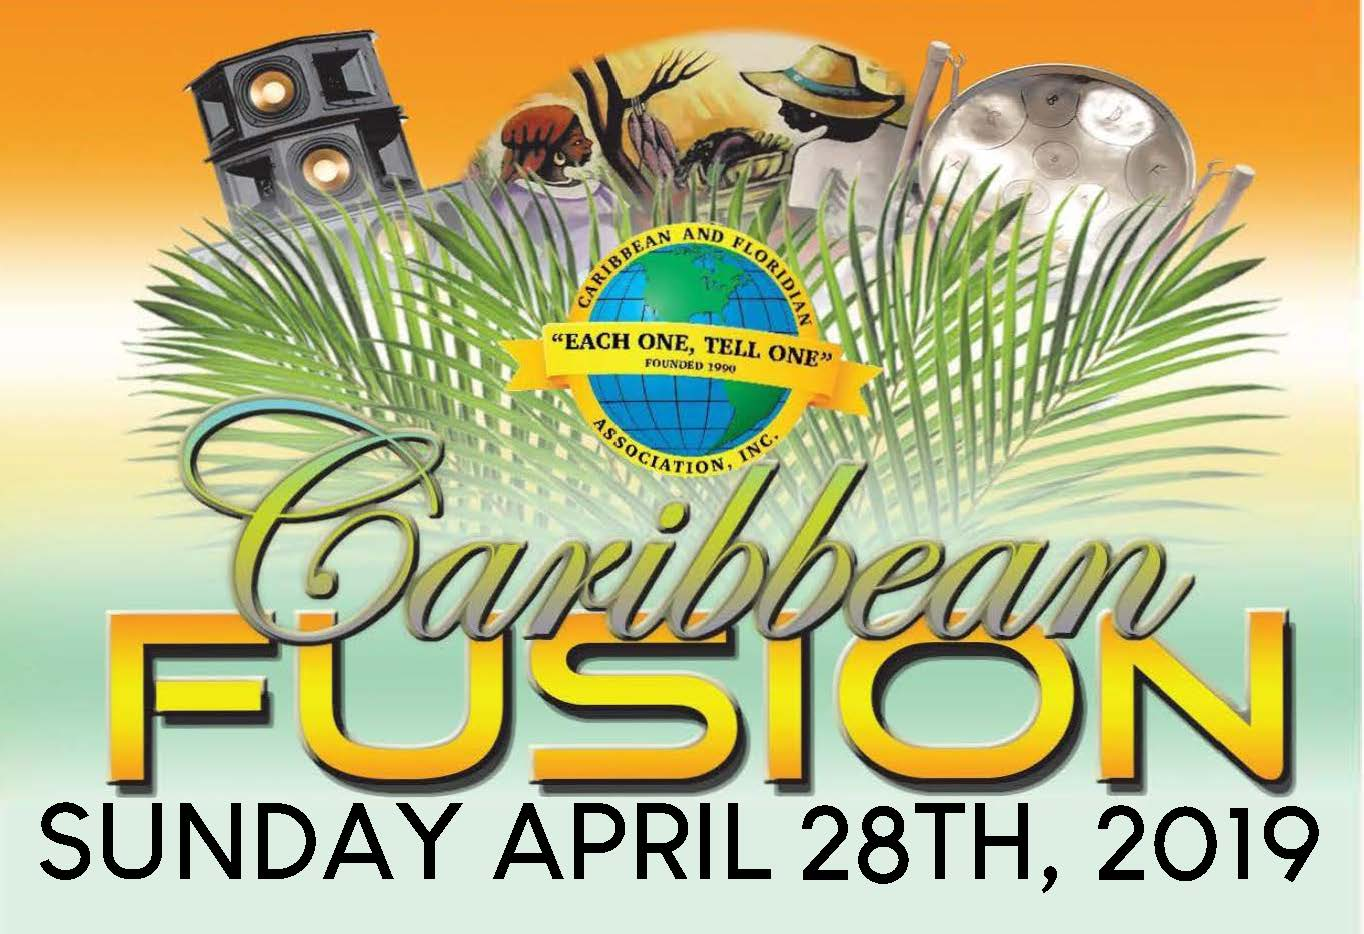 Caribbean Fusion Festival 2019